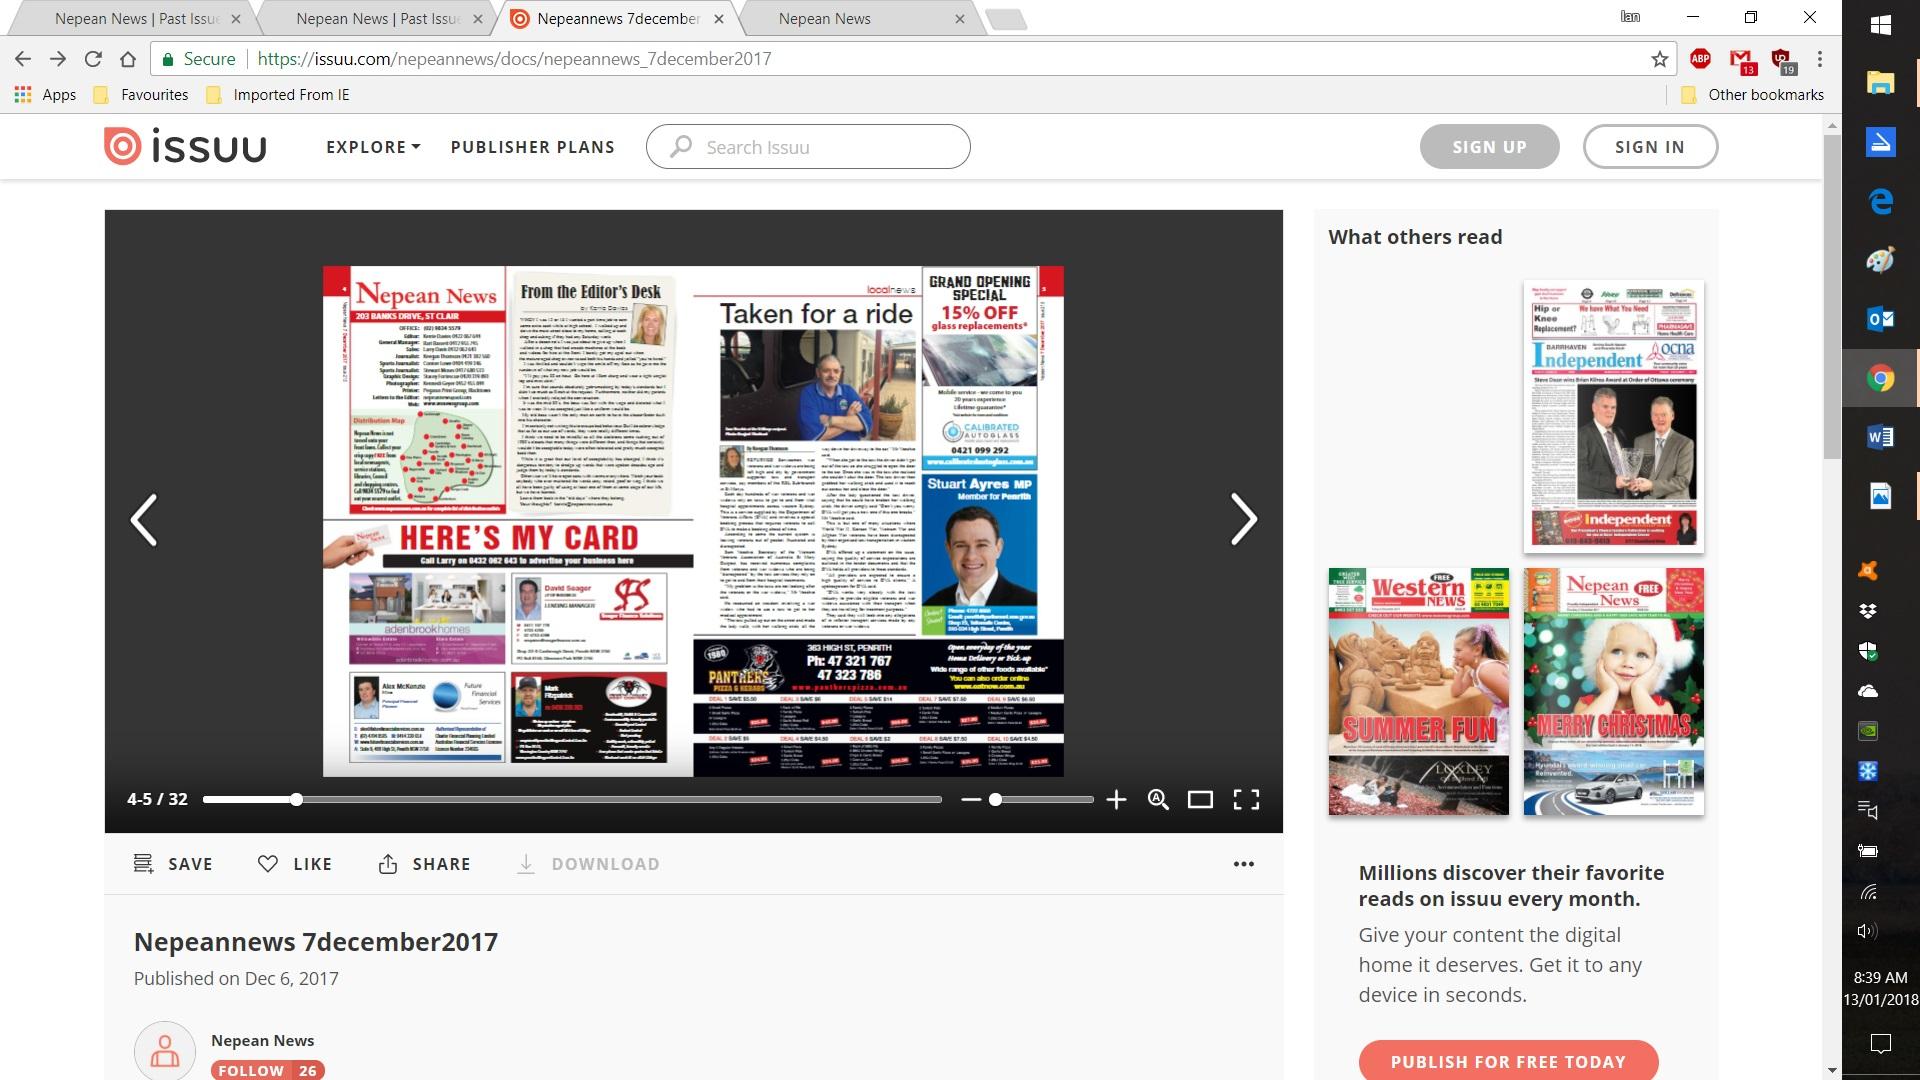 Nepean News Screenshot 2018-01-13 08.39.13